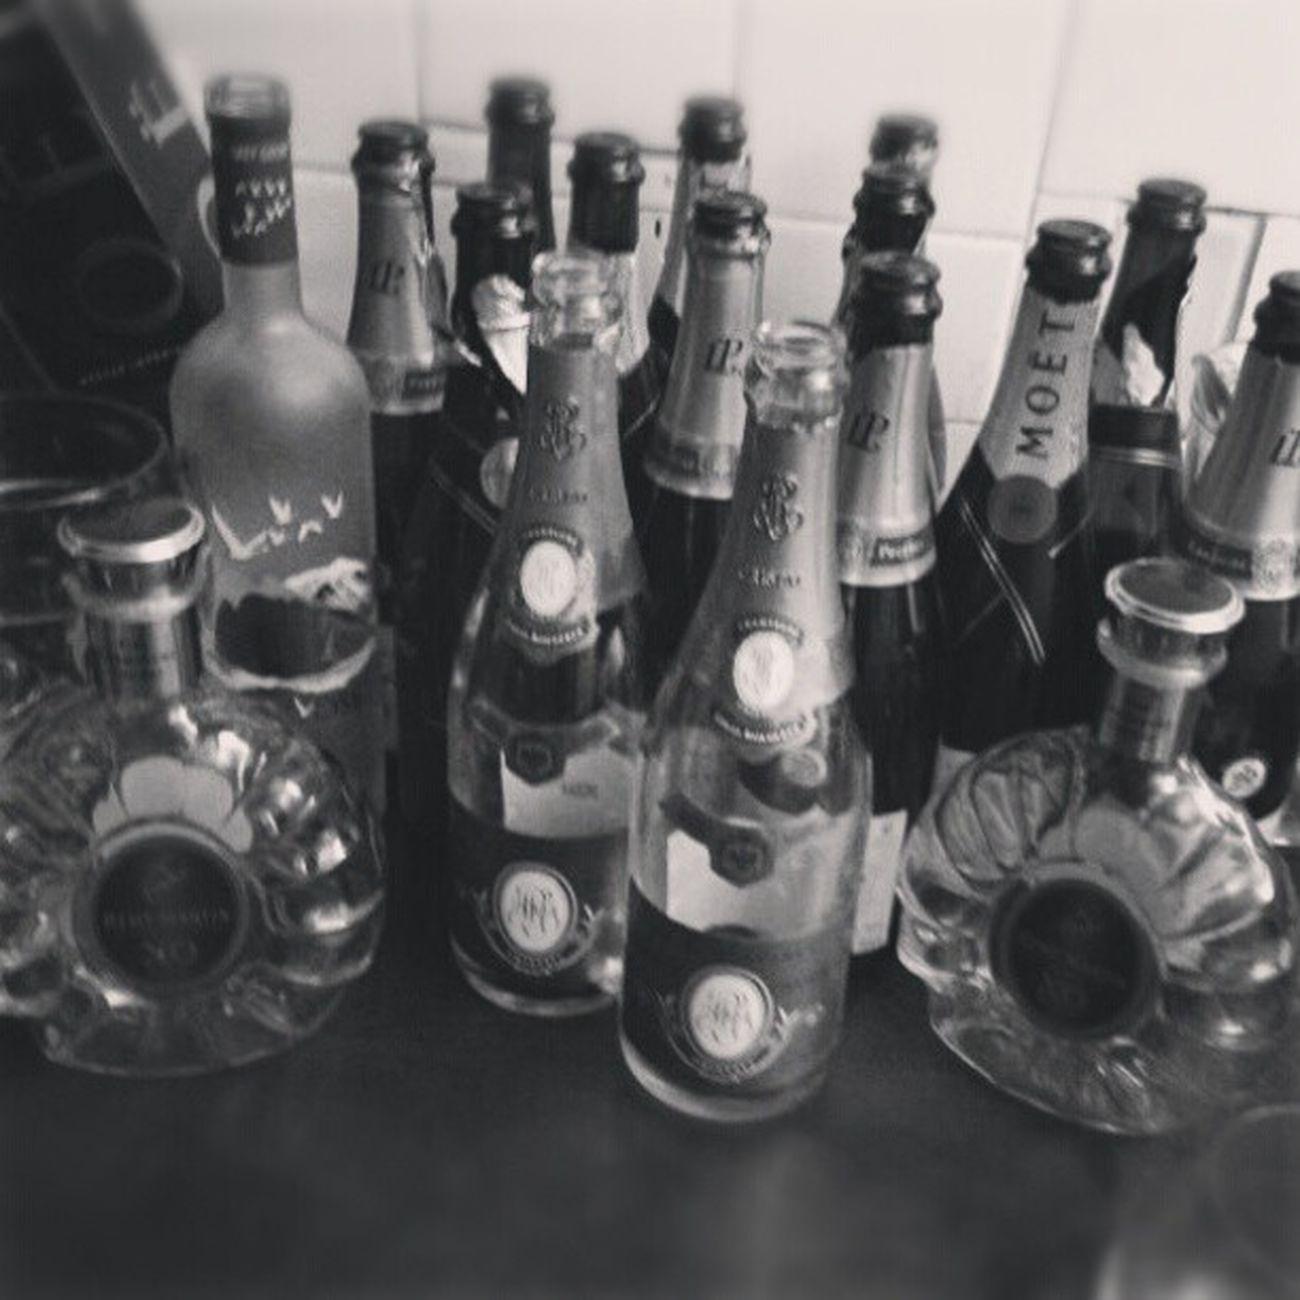 Maybe we should stop drinking. NYE Champagne Cognac Xo GreyGoose Moet LaurentPerrier Cristal LouisRoederer